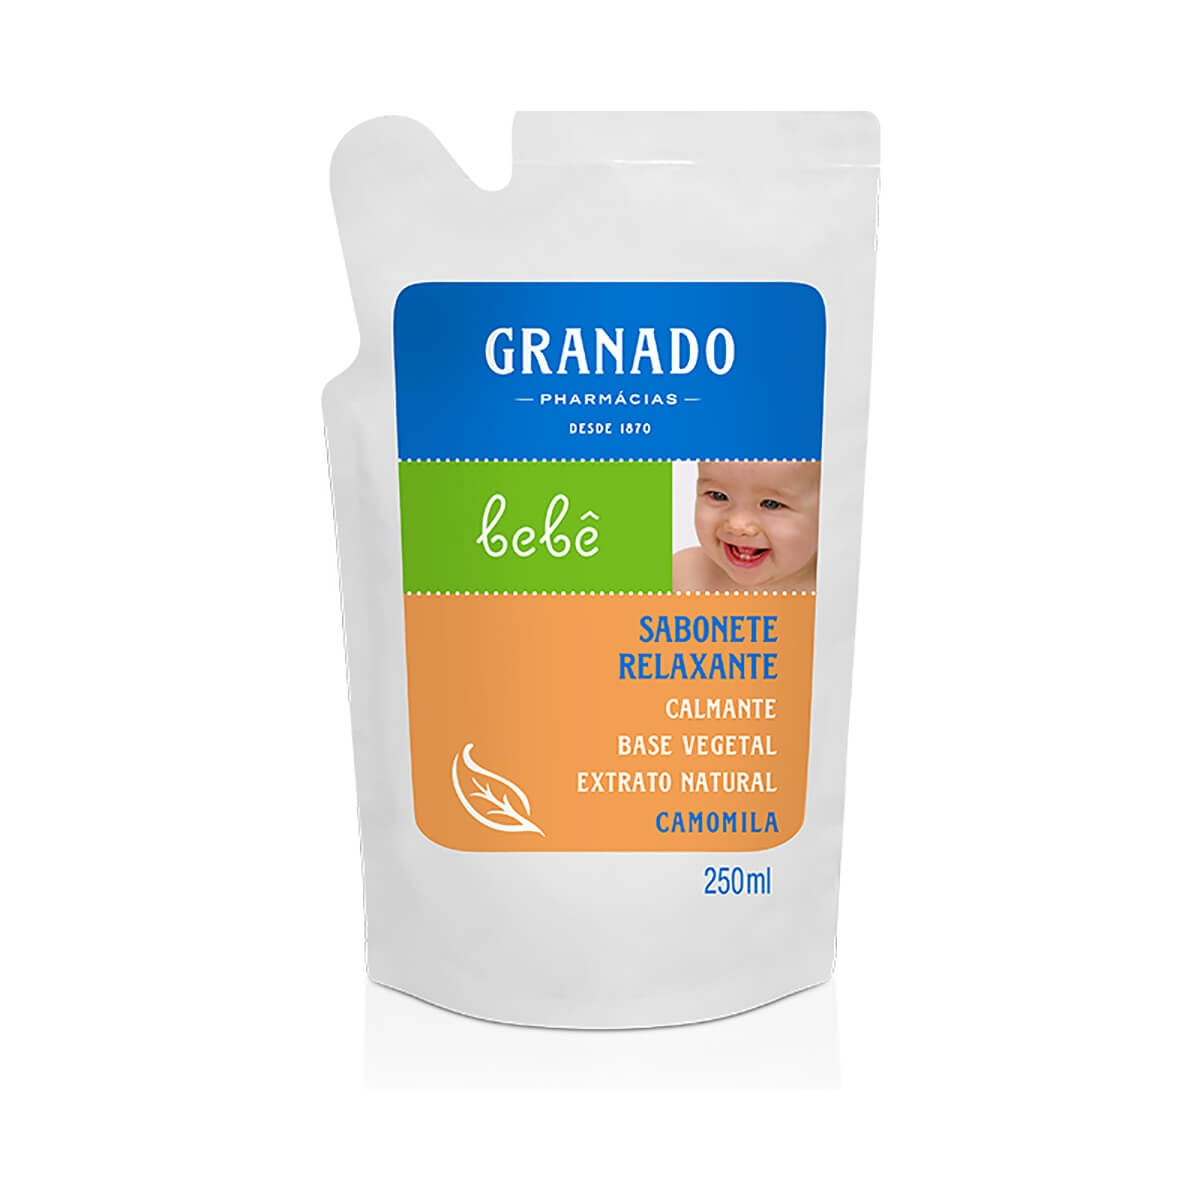 Refil Sabonete Líquido Granado Bebê Camomila 250ml